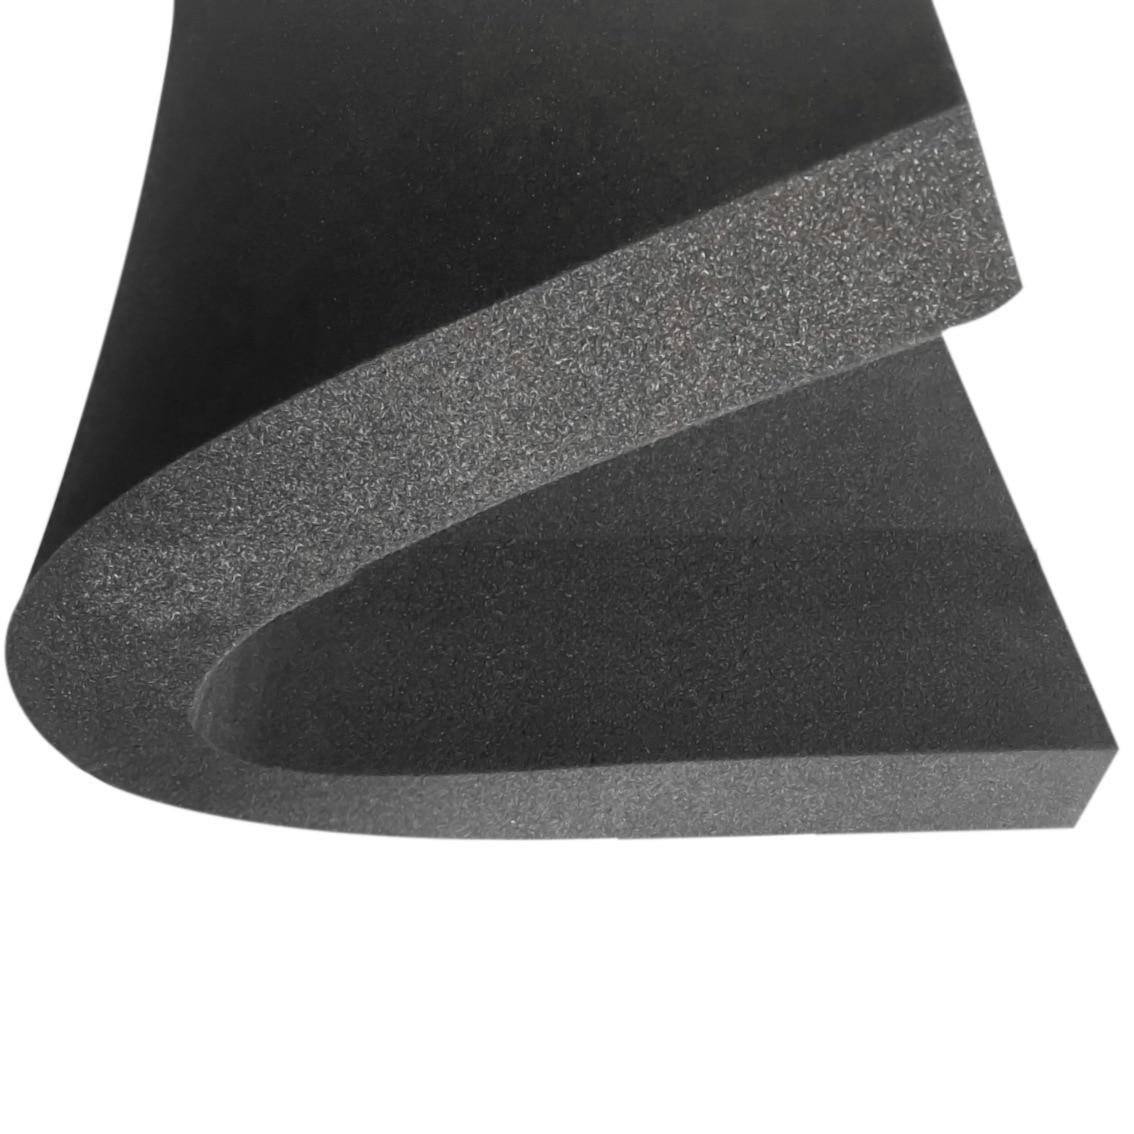 Sponge packaging lining, electronic products shock-absorbing and drop-proof sponge gasket, high-density sponge sheet, sponge mat